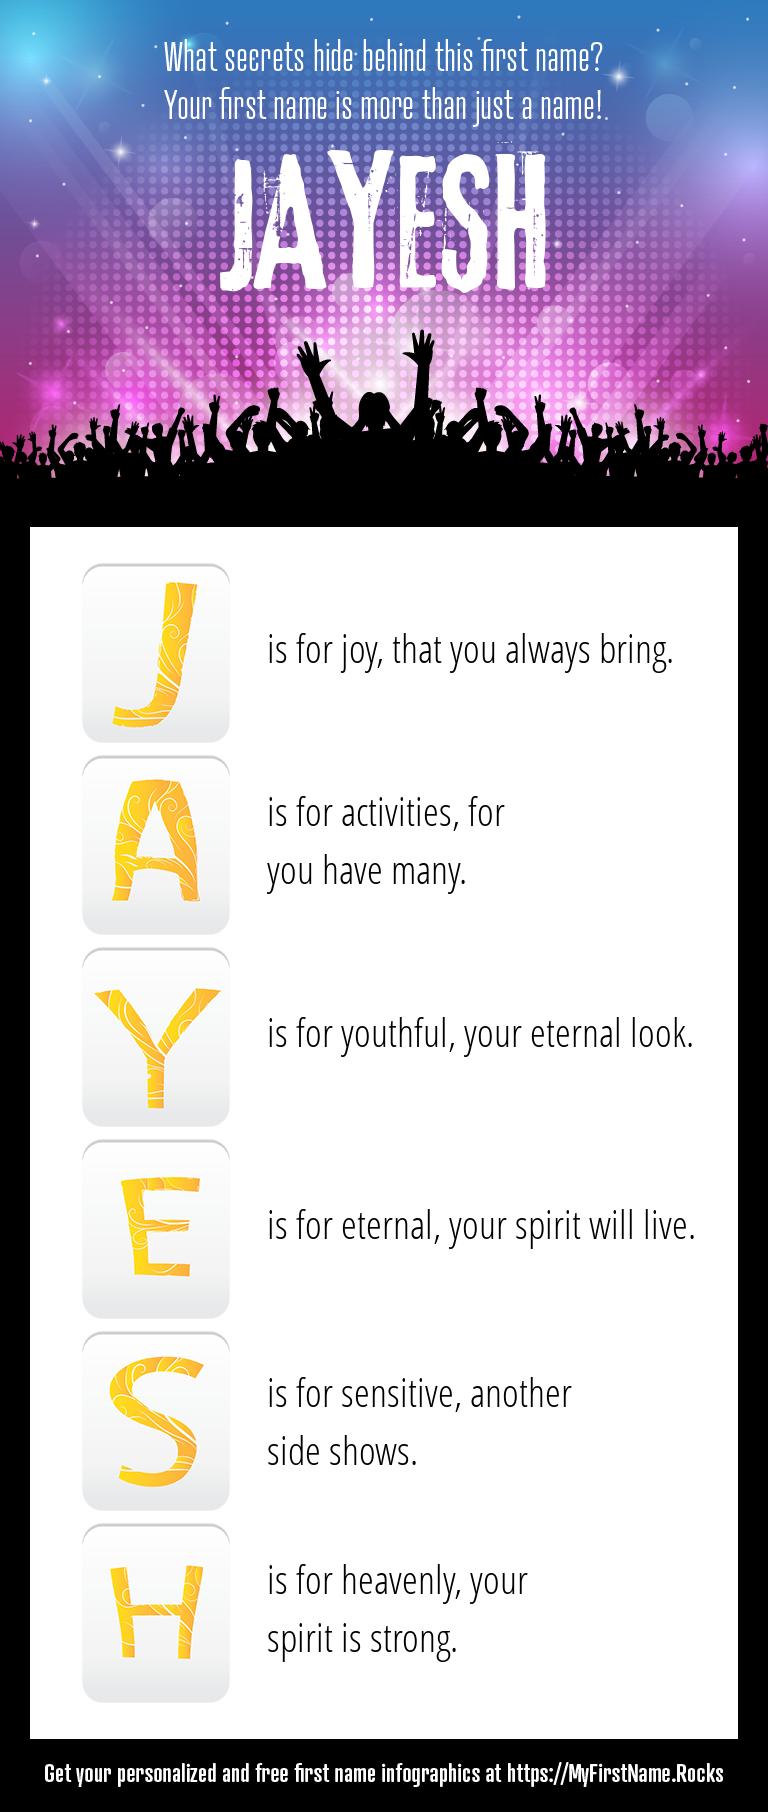 Jayesh Infographics